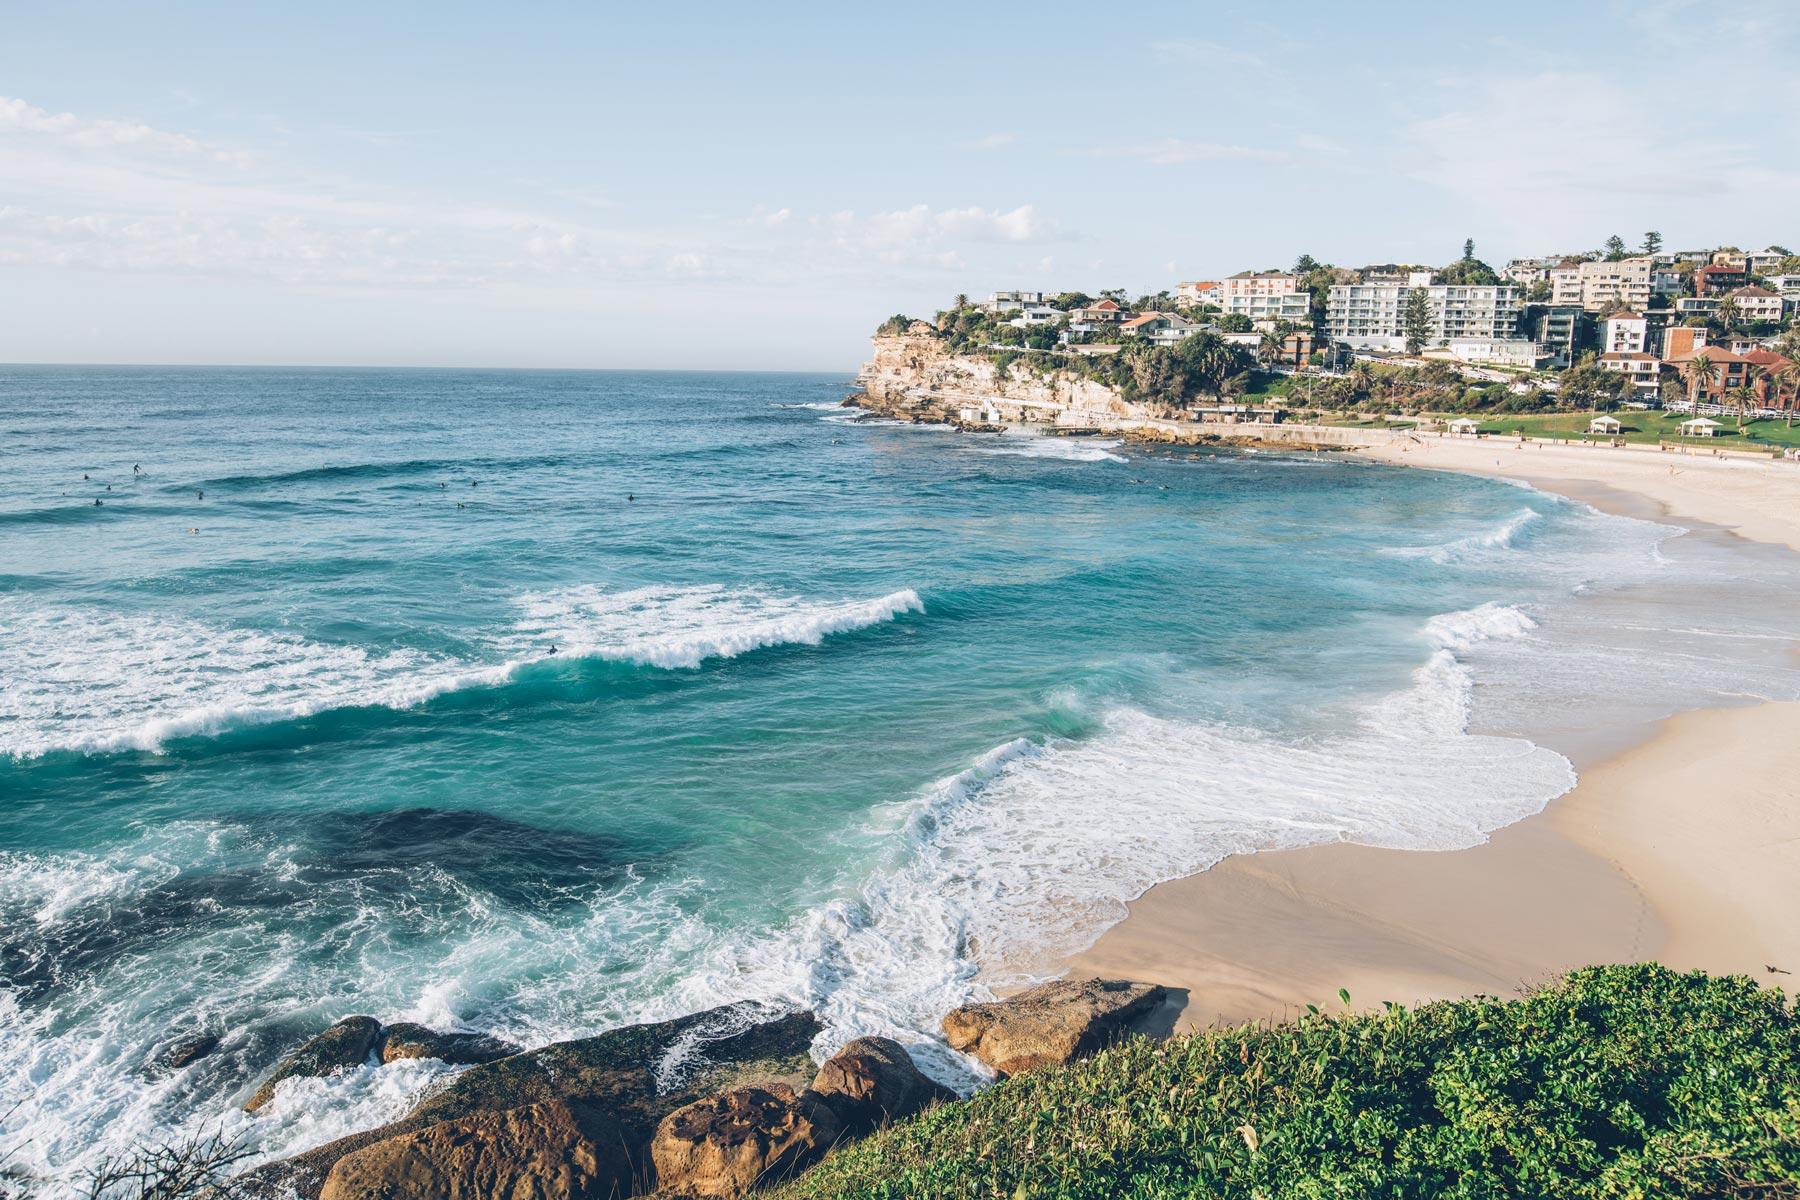 Rando Bondi-Coogee, Sydney